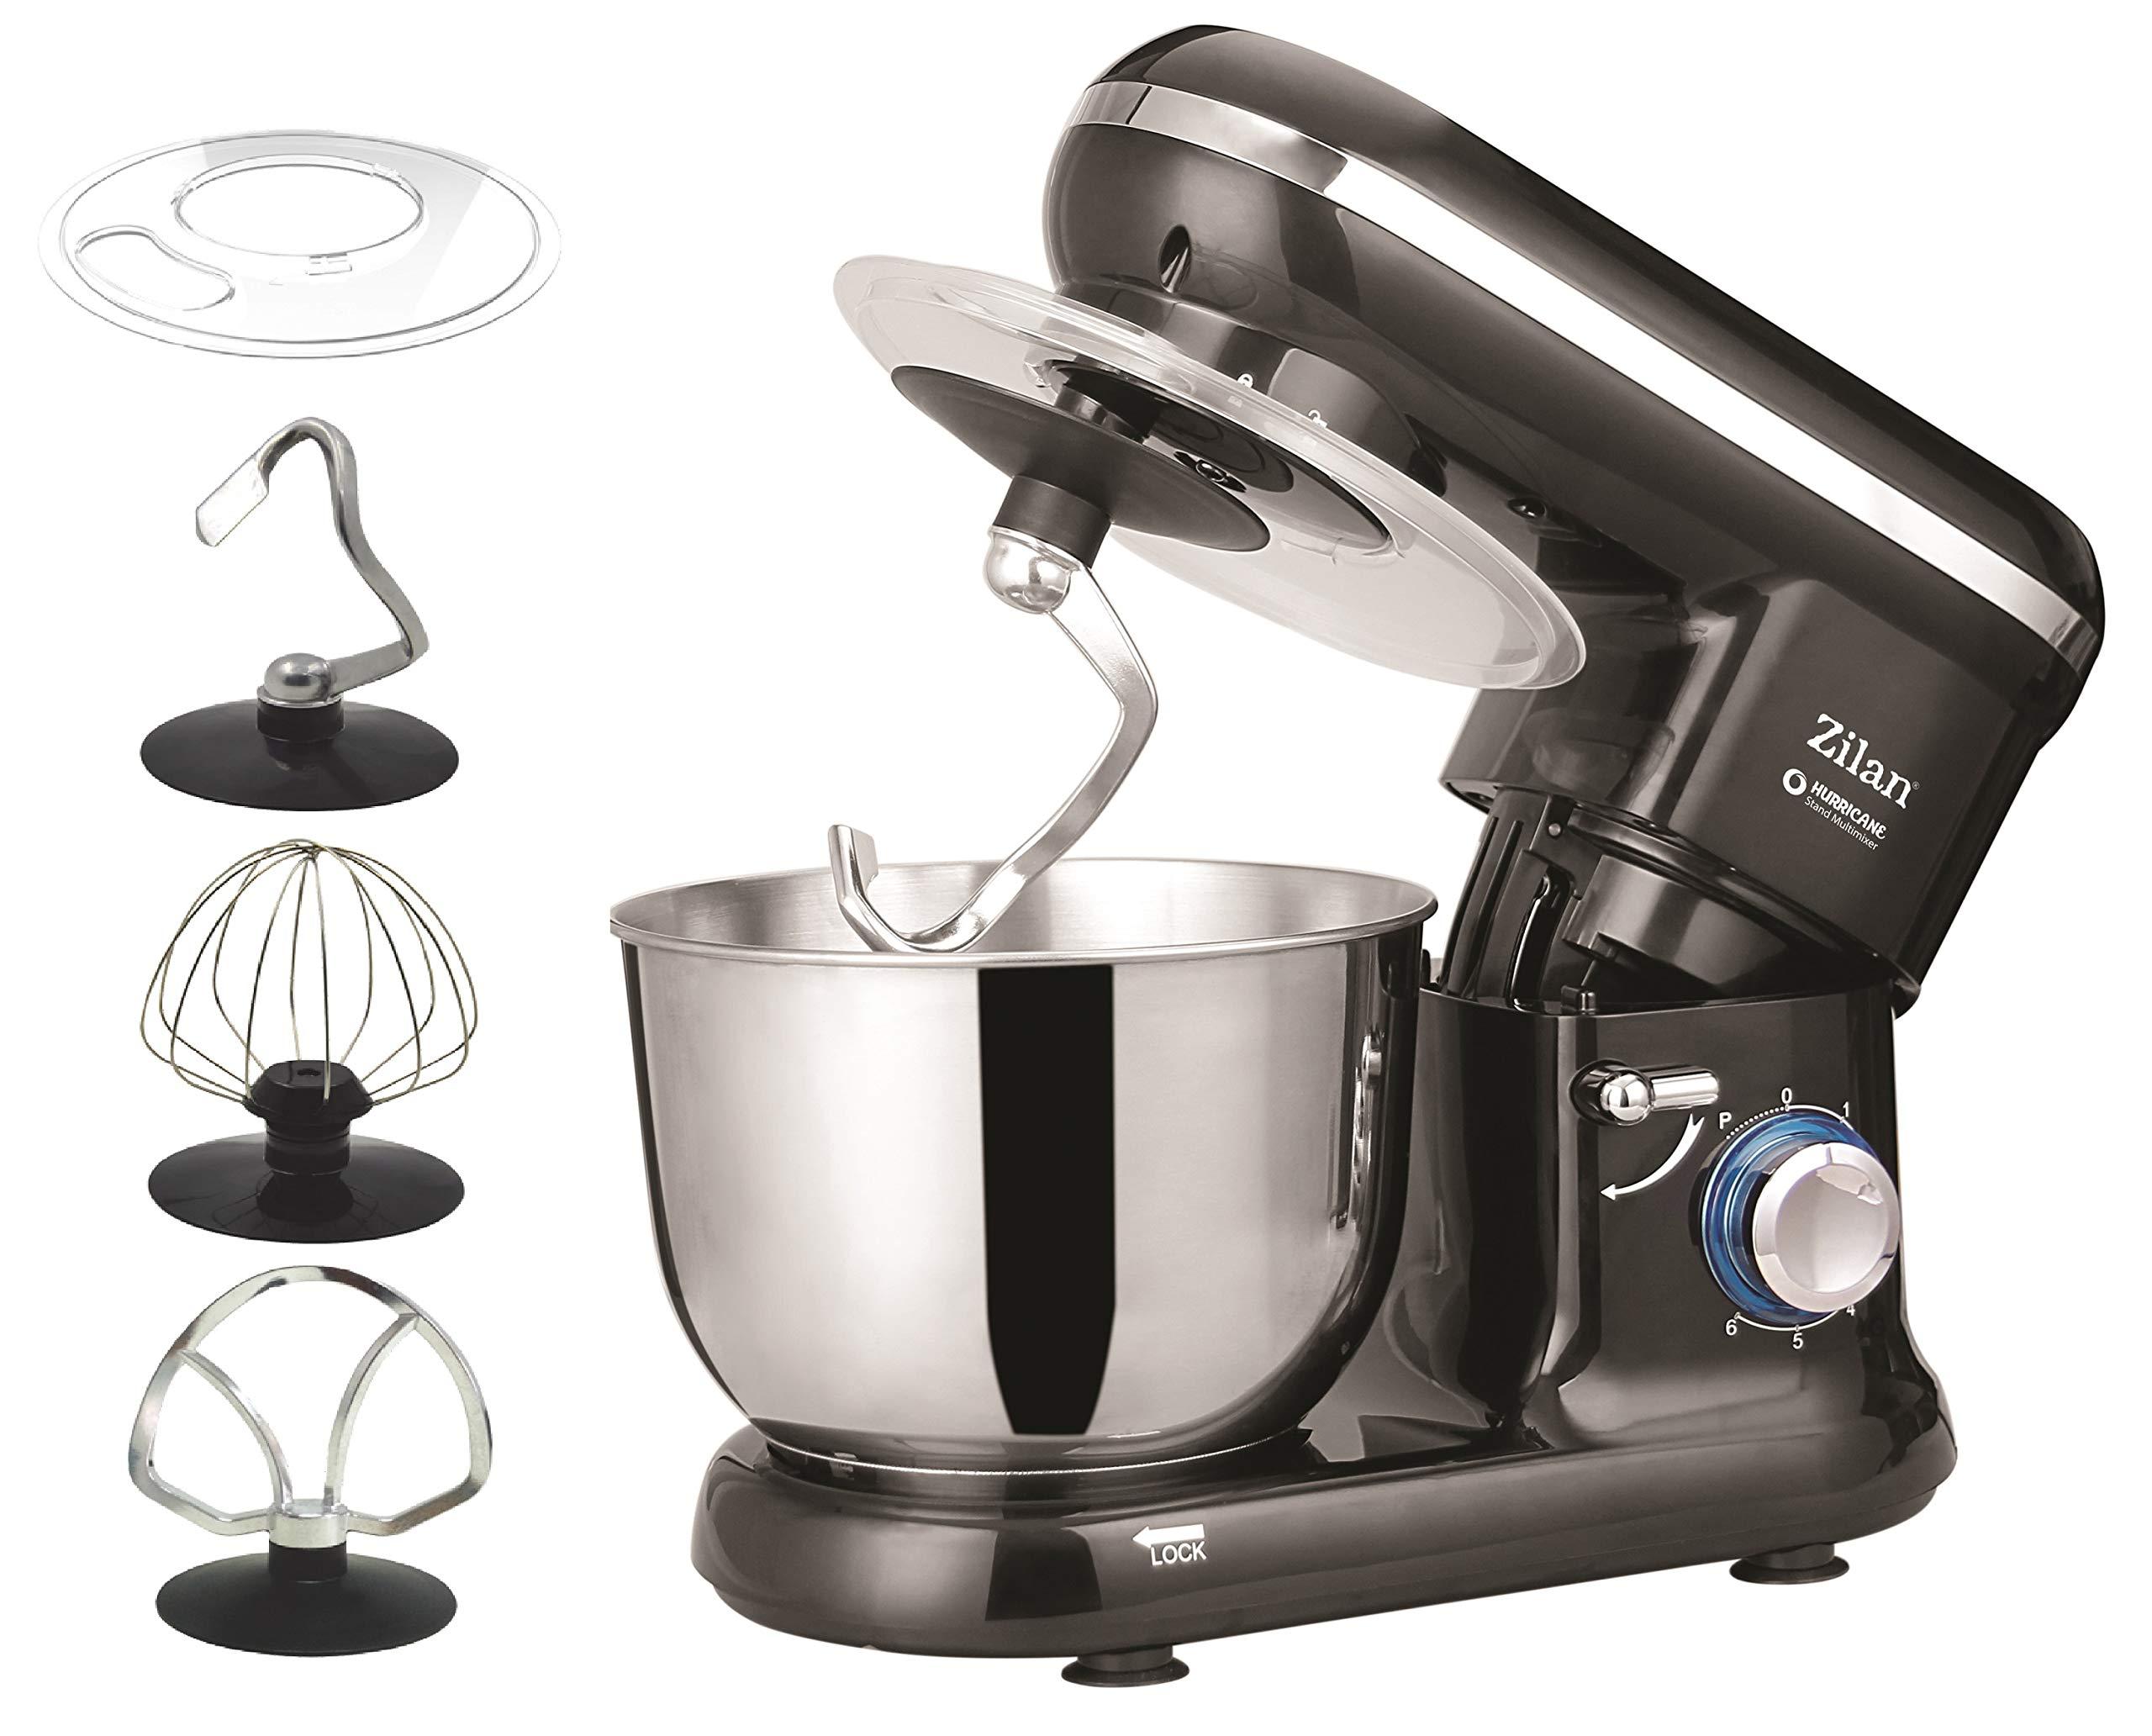 Robot de cocina | amasadora | Masa eléctrica | – Amasadora, amasadora de masa, 1500 W, 6 niveles de velocidad, función de pulso | 4,5 litros |: Amazon.es: Hogar